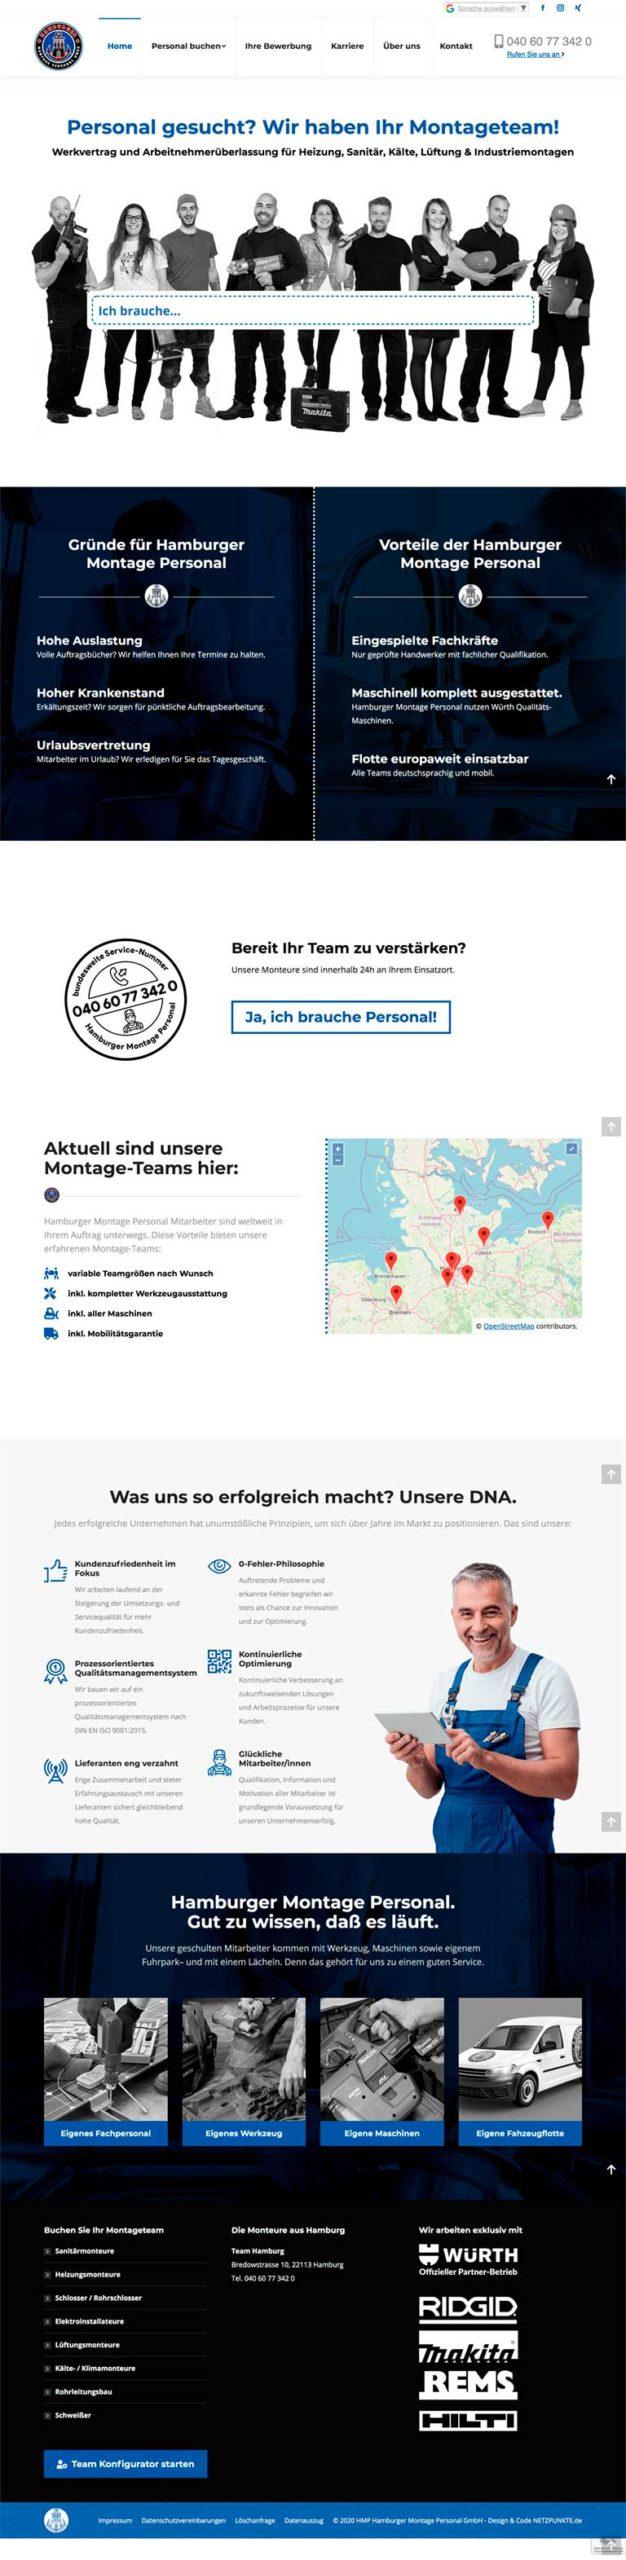 webdesign-referenz-hamburger-montagepersonal